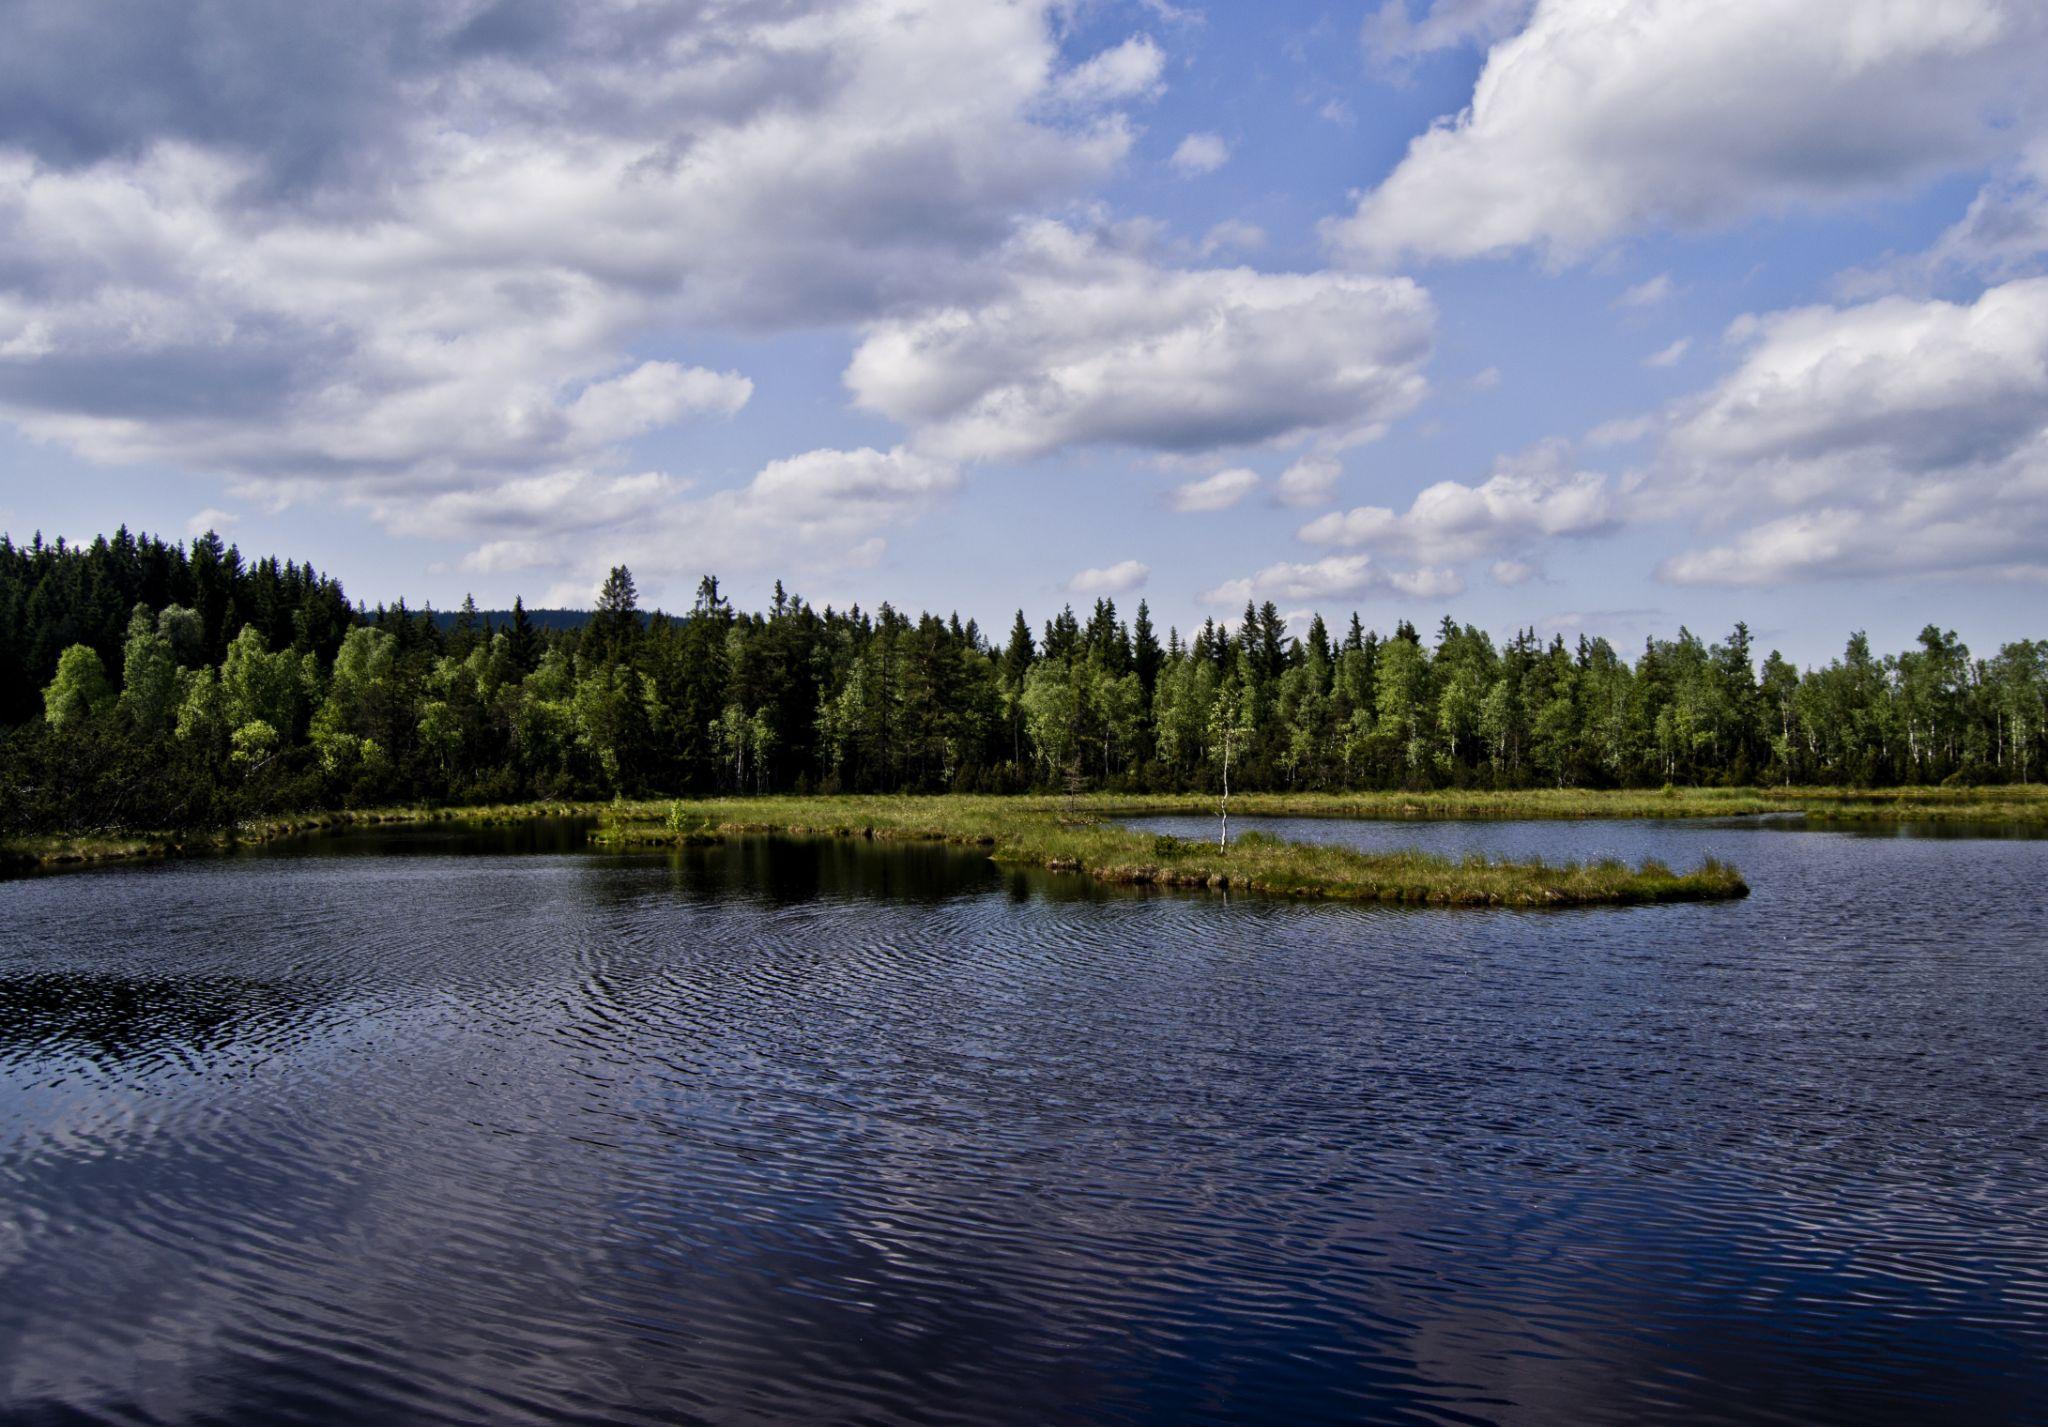 Bohemia Forest by papaaja9